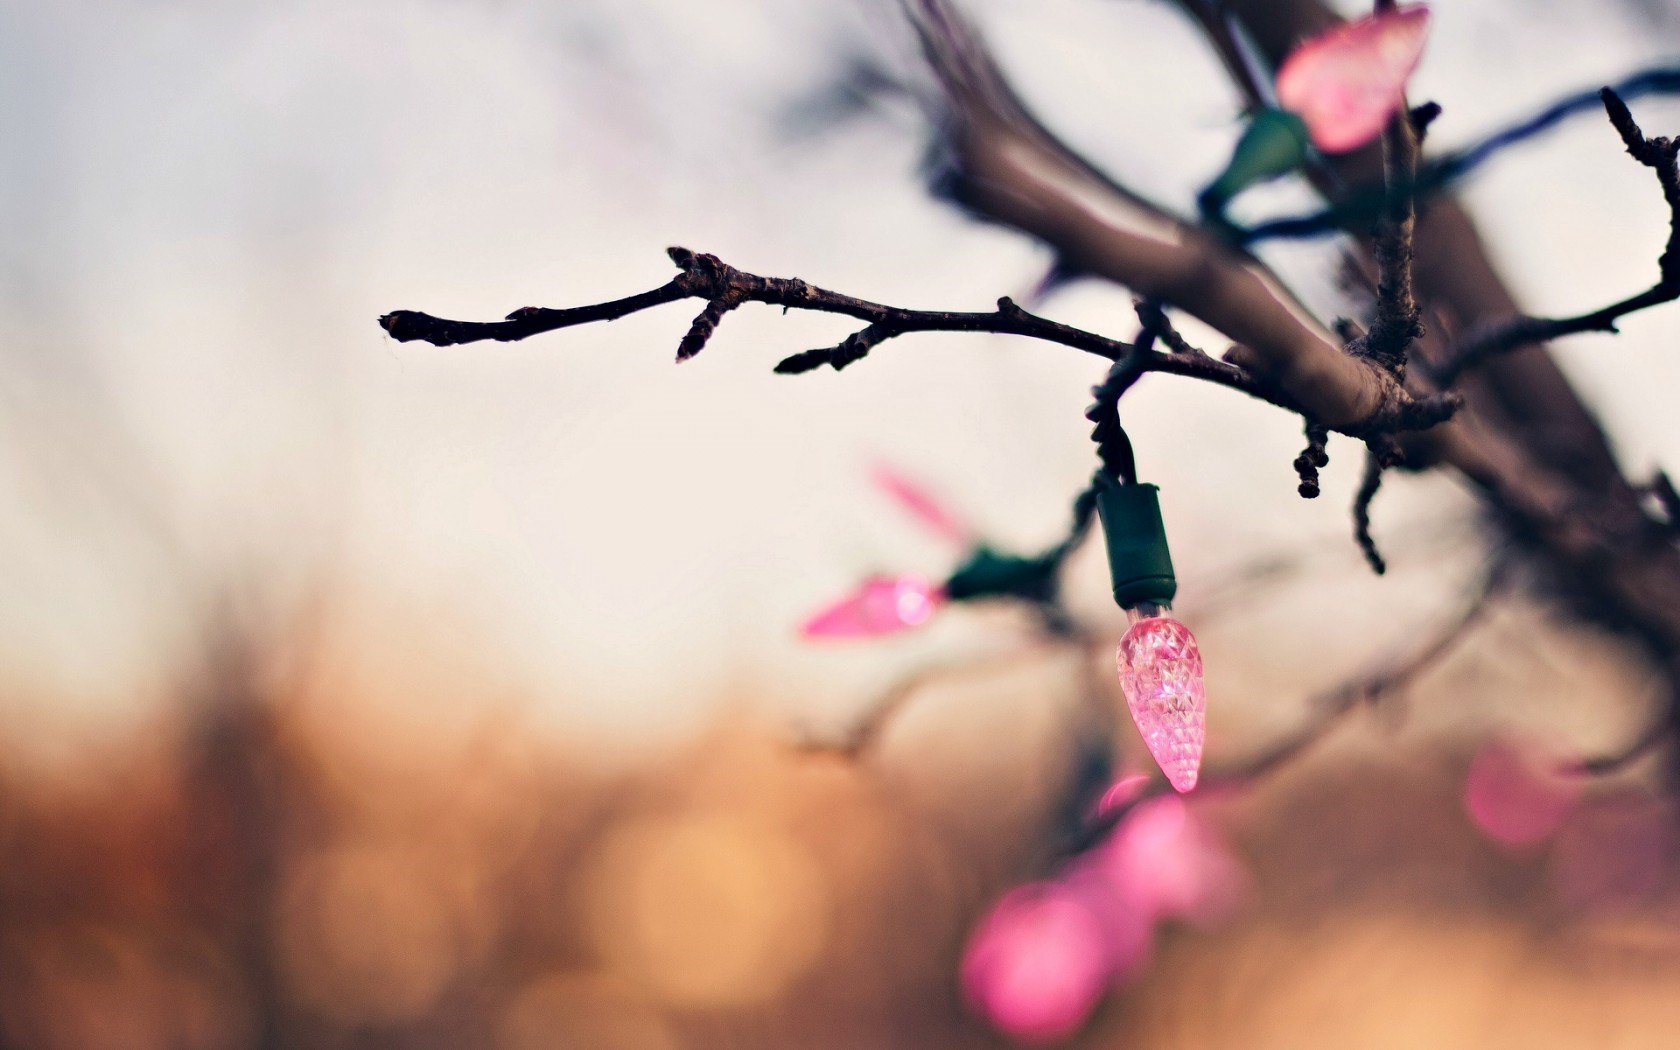 Holiday Tree Branch Garland Lights Pink New Year